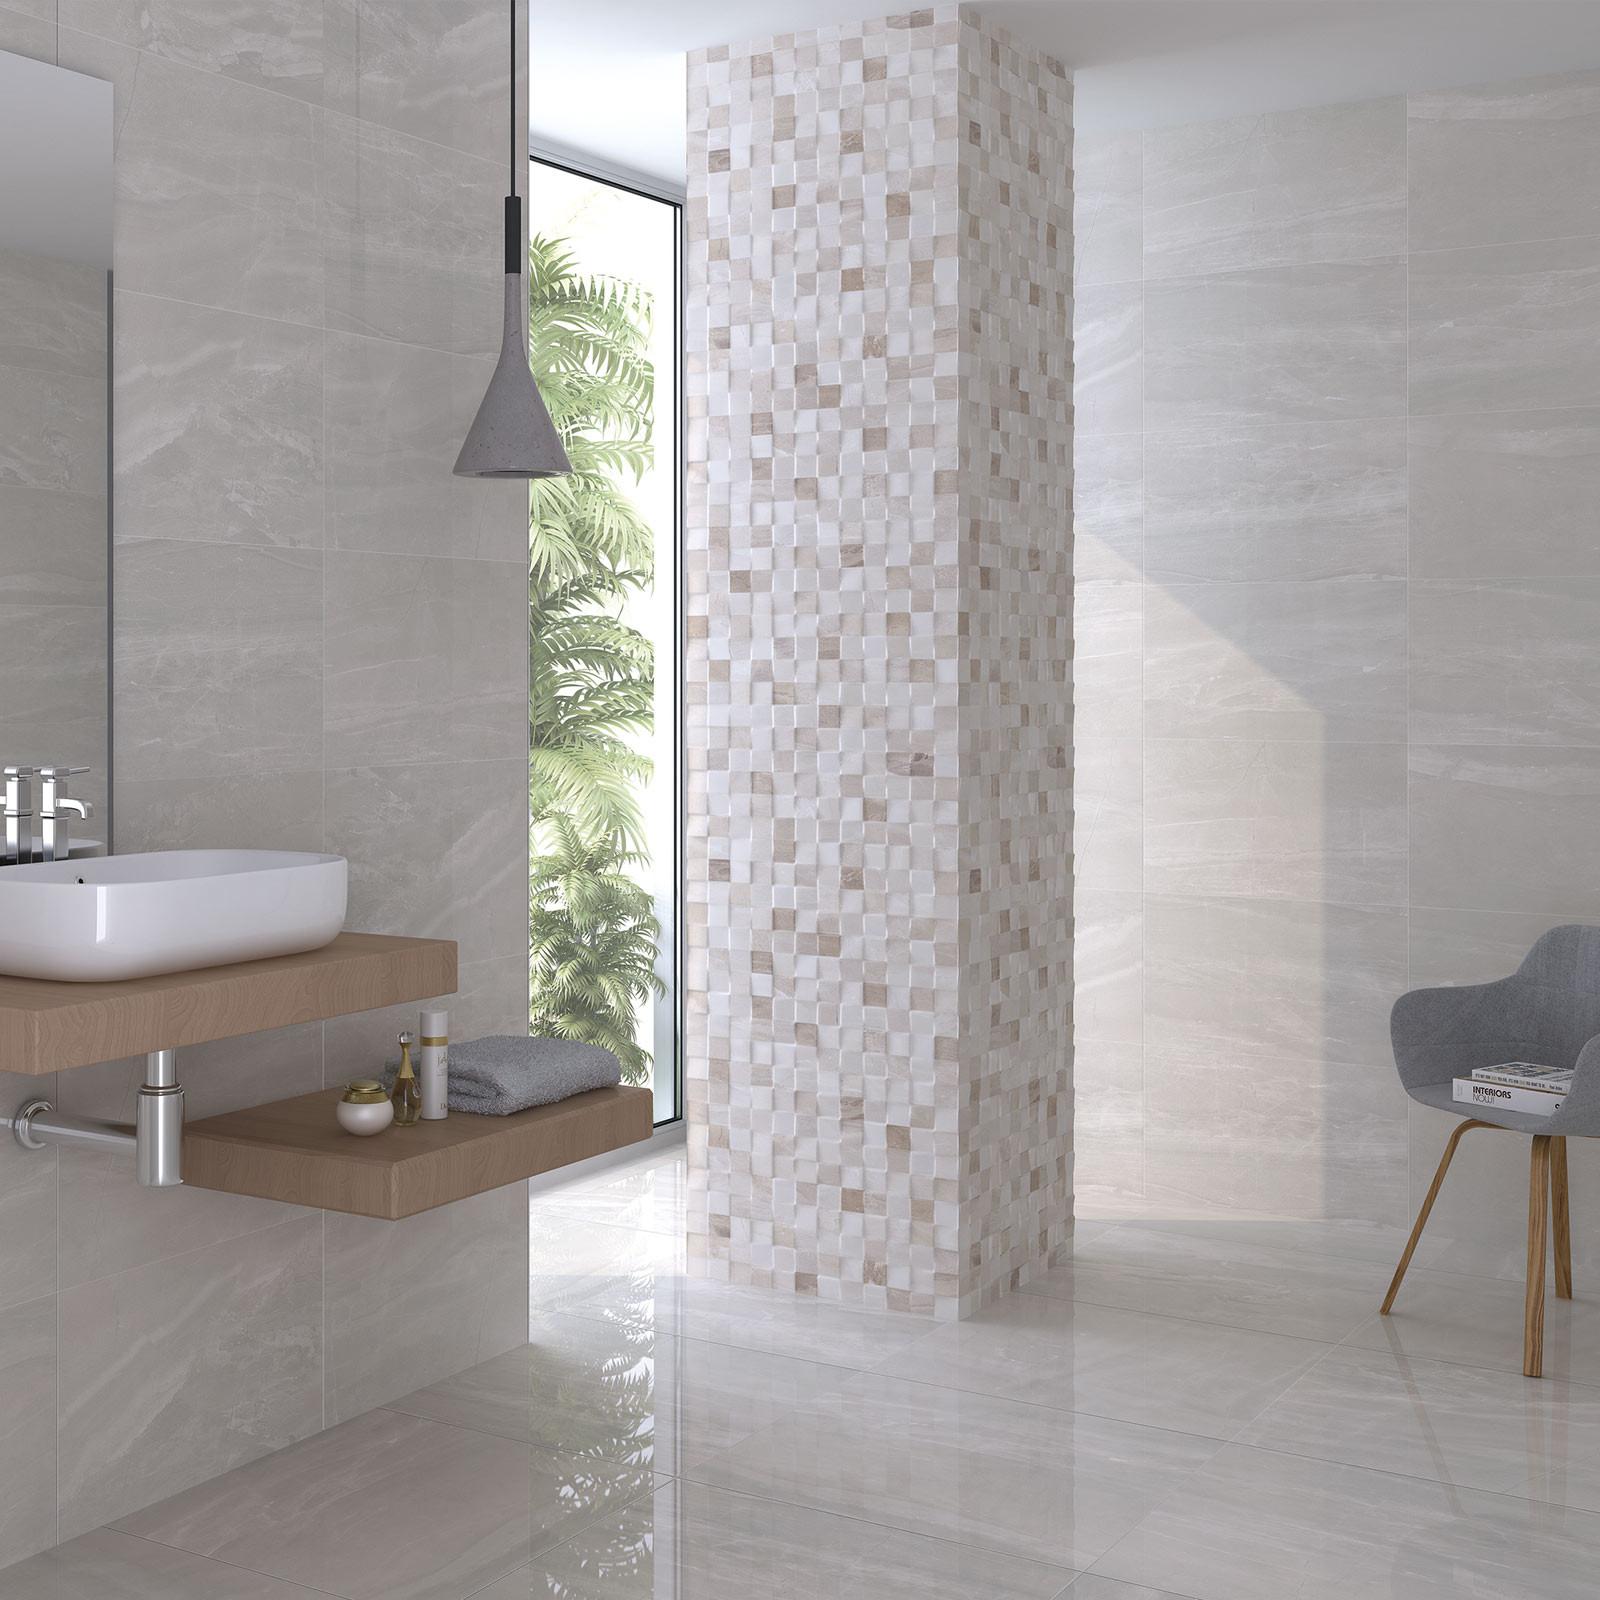 Atrium Kios Gris Glazed Porcelain Floor Tile: Atrium Kios Gris Relieve Glazed Porcelain Wall Tile